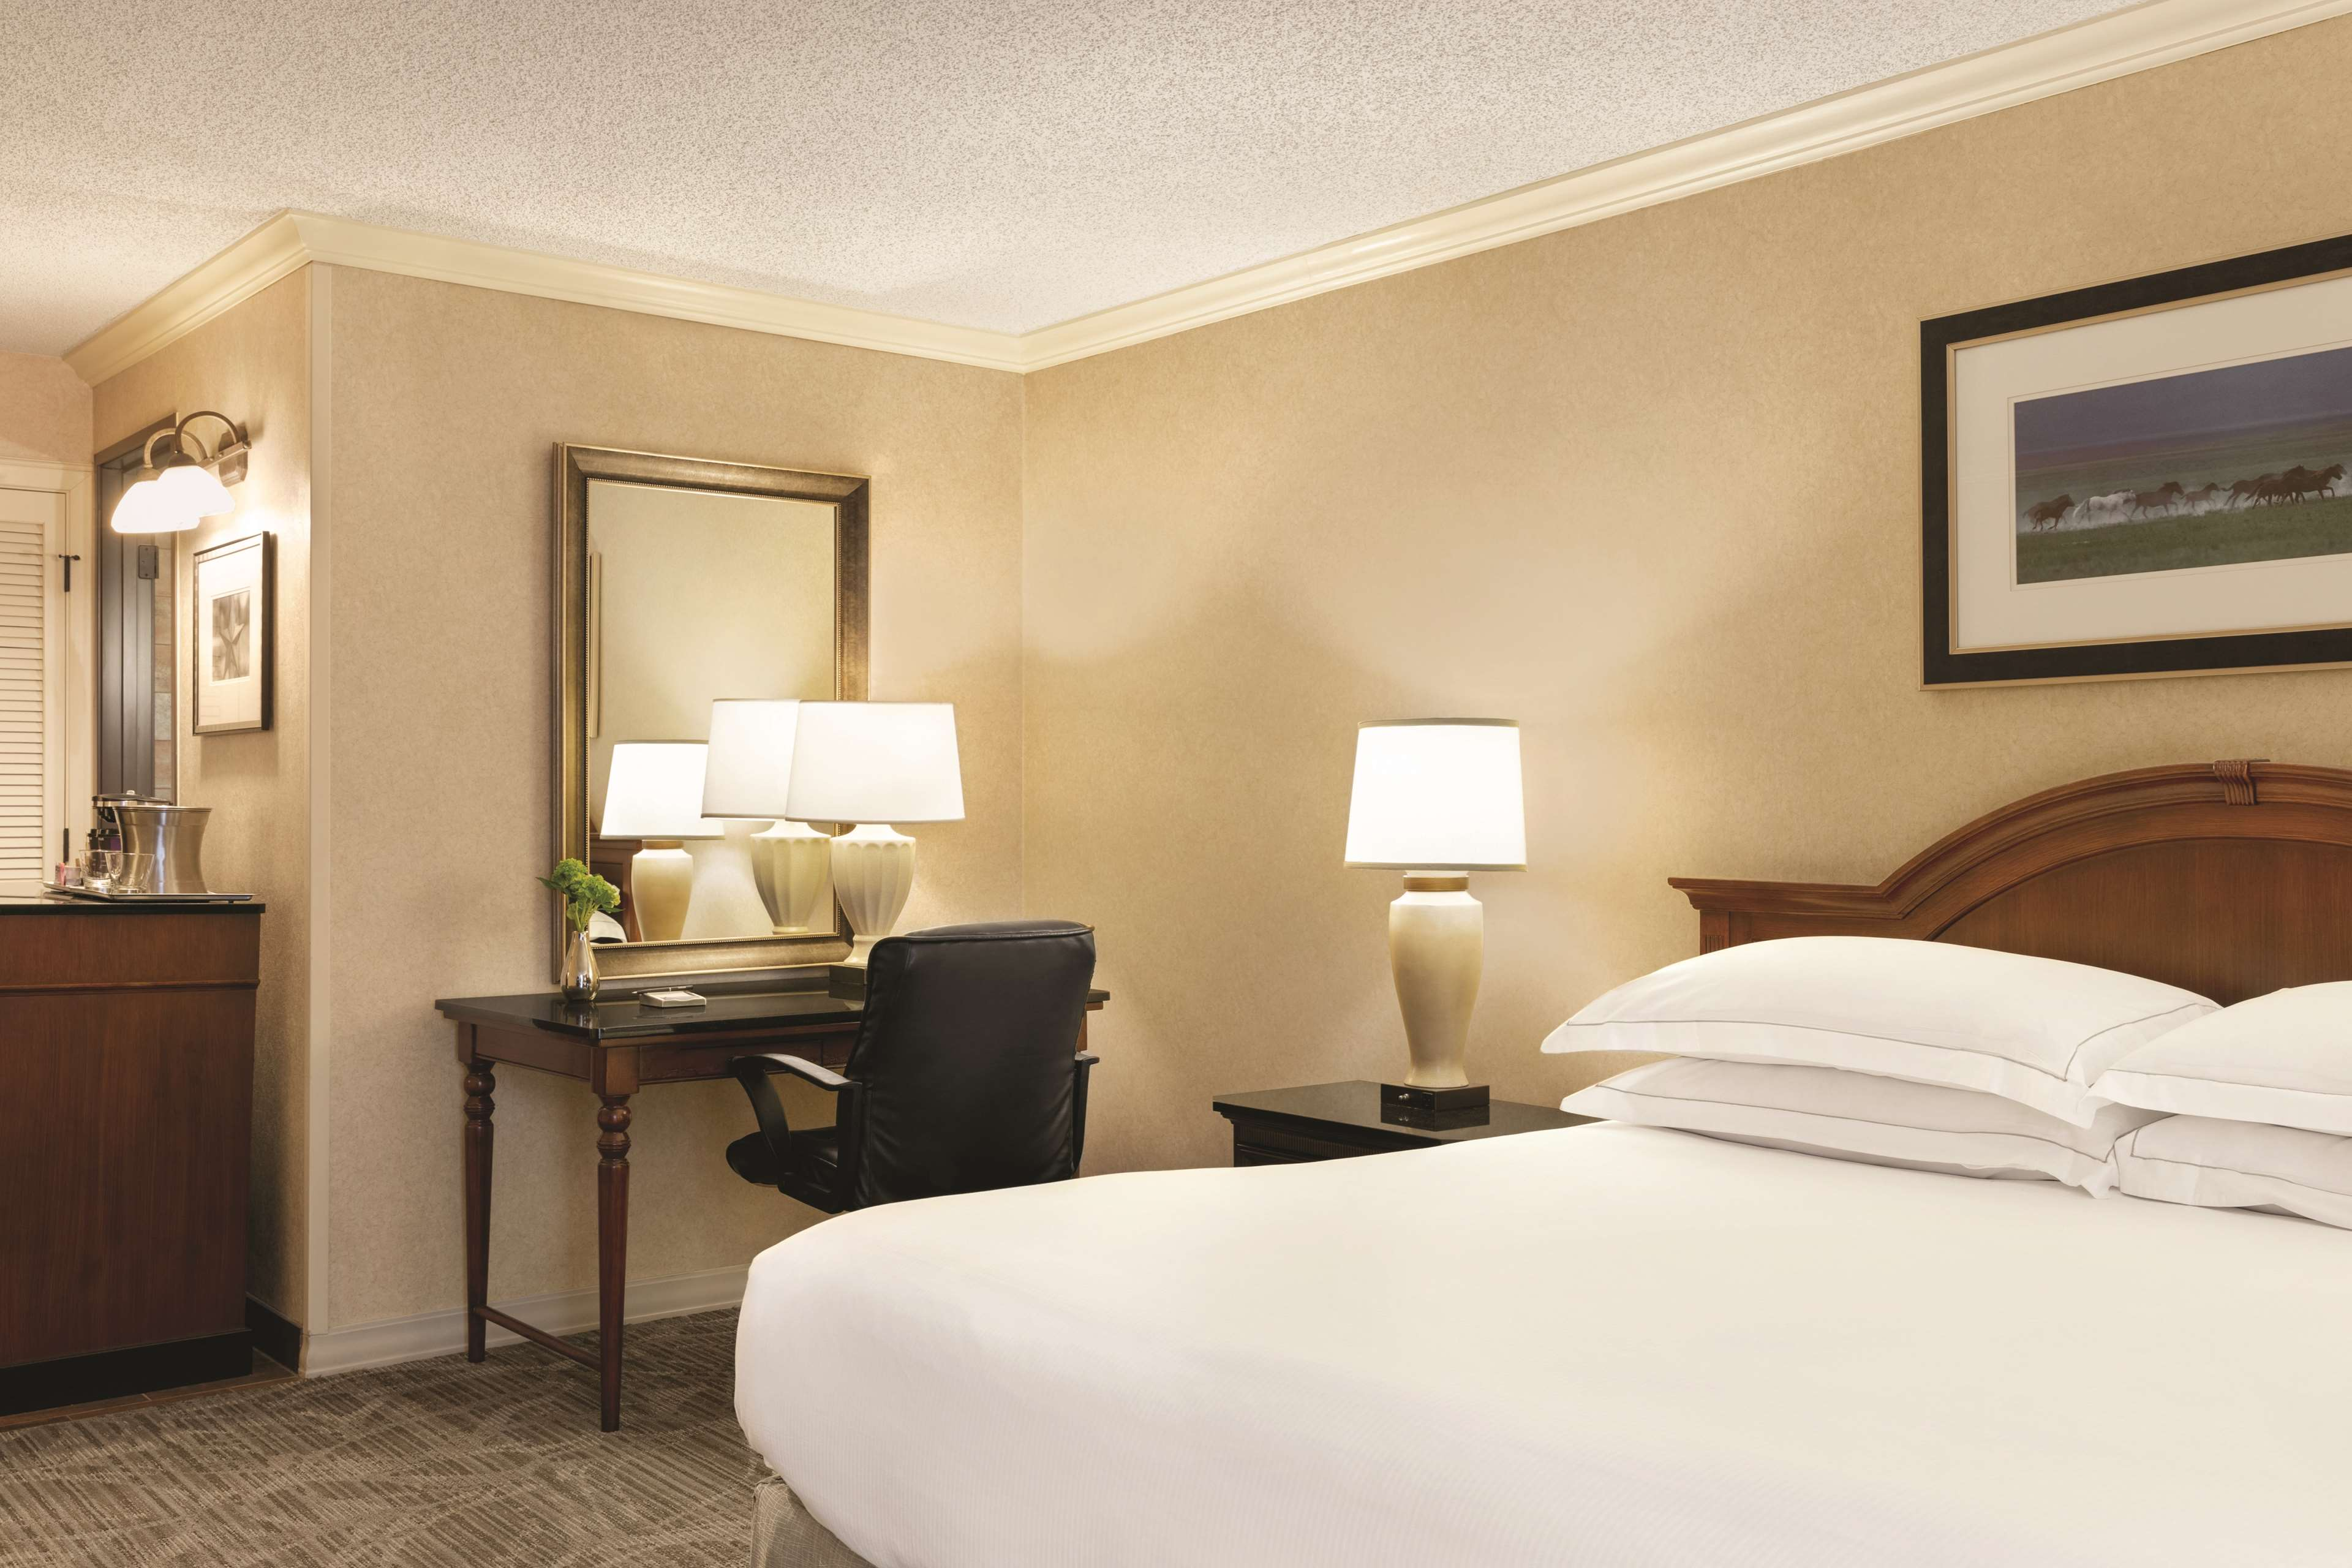 Hilton DFW Lakes Executive Conference Center image 35